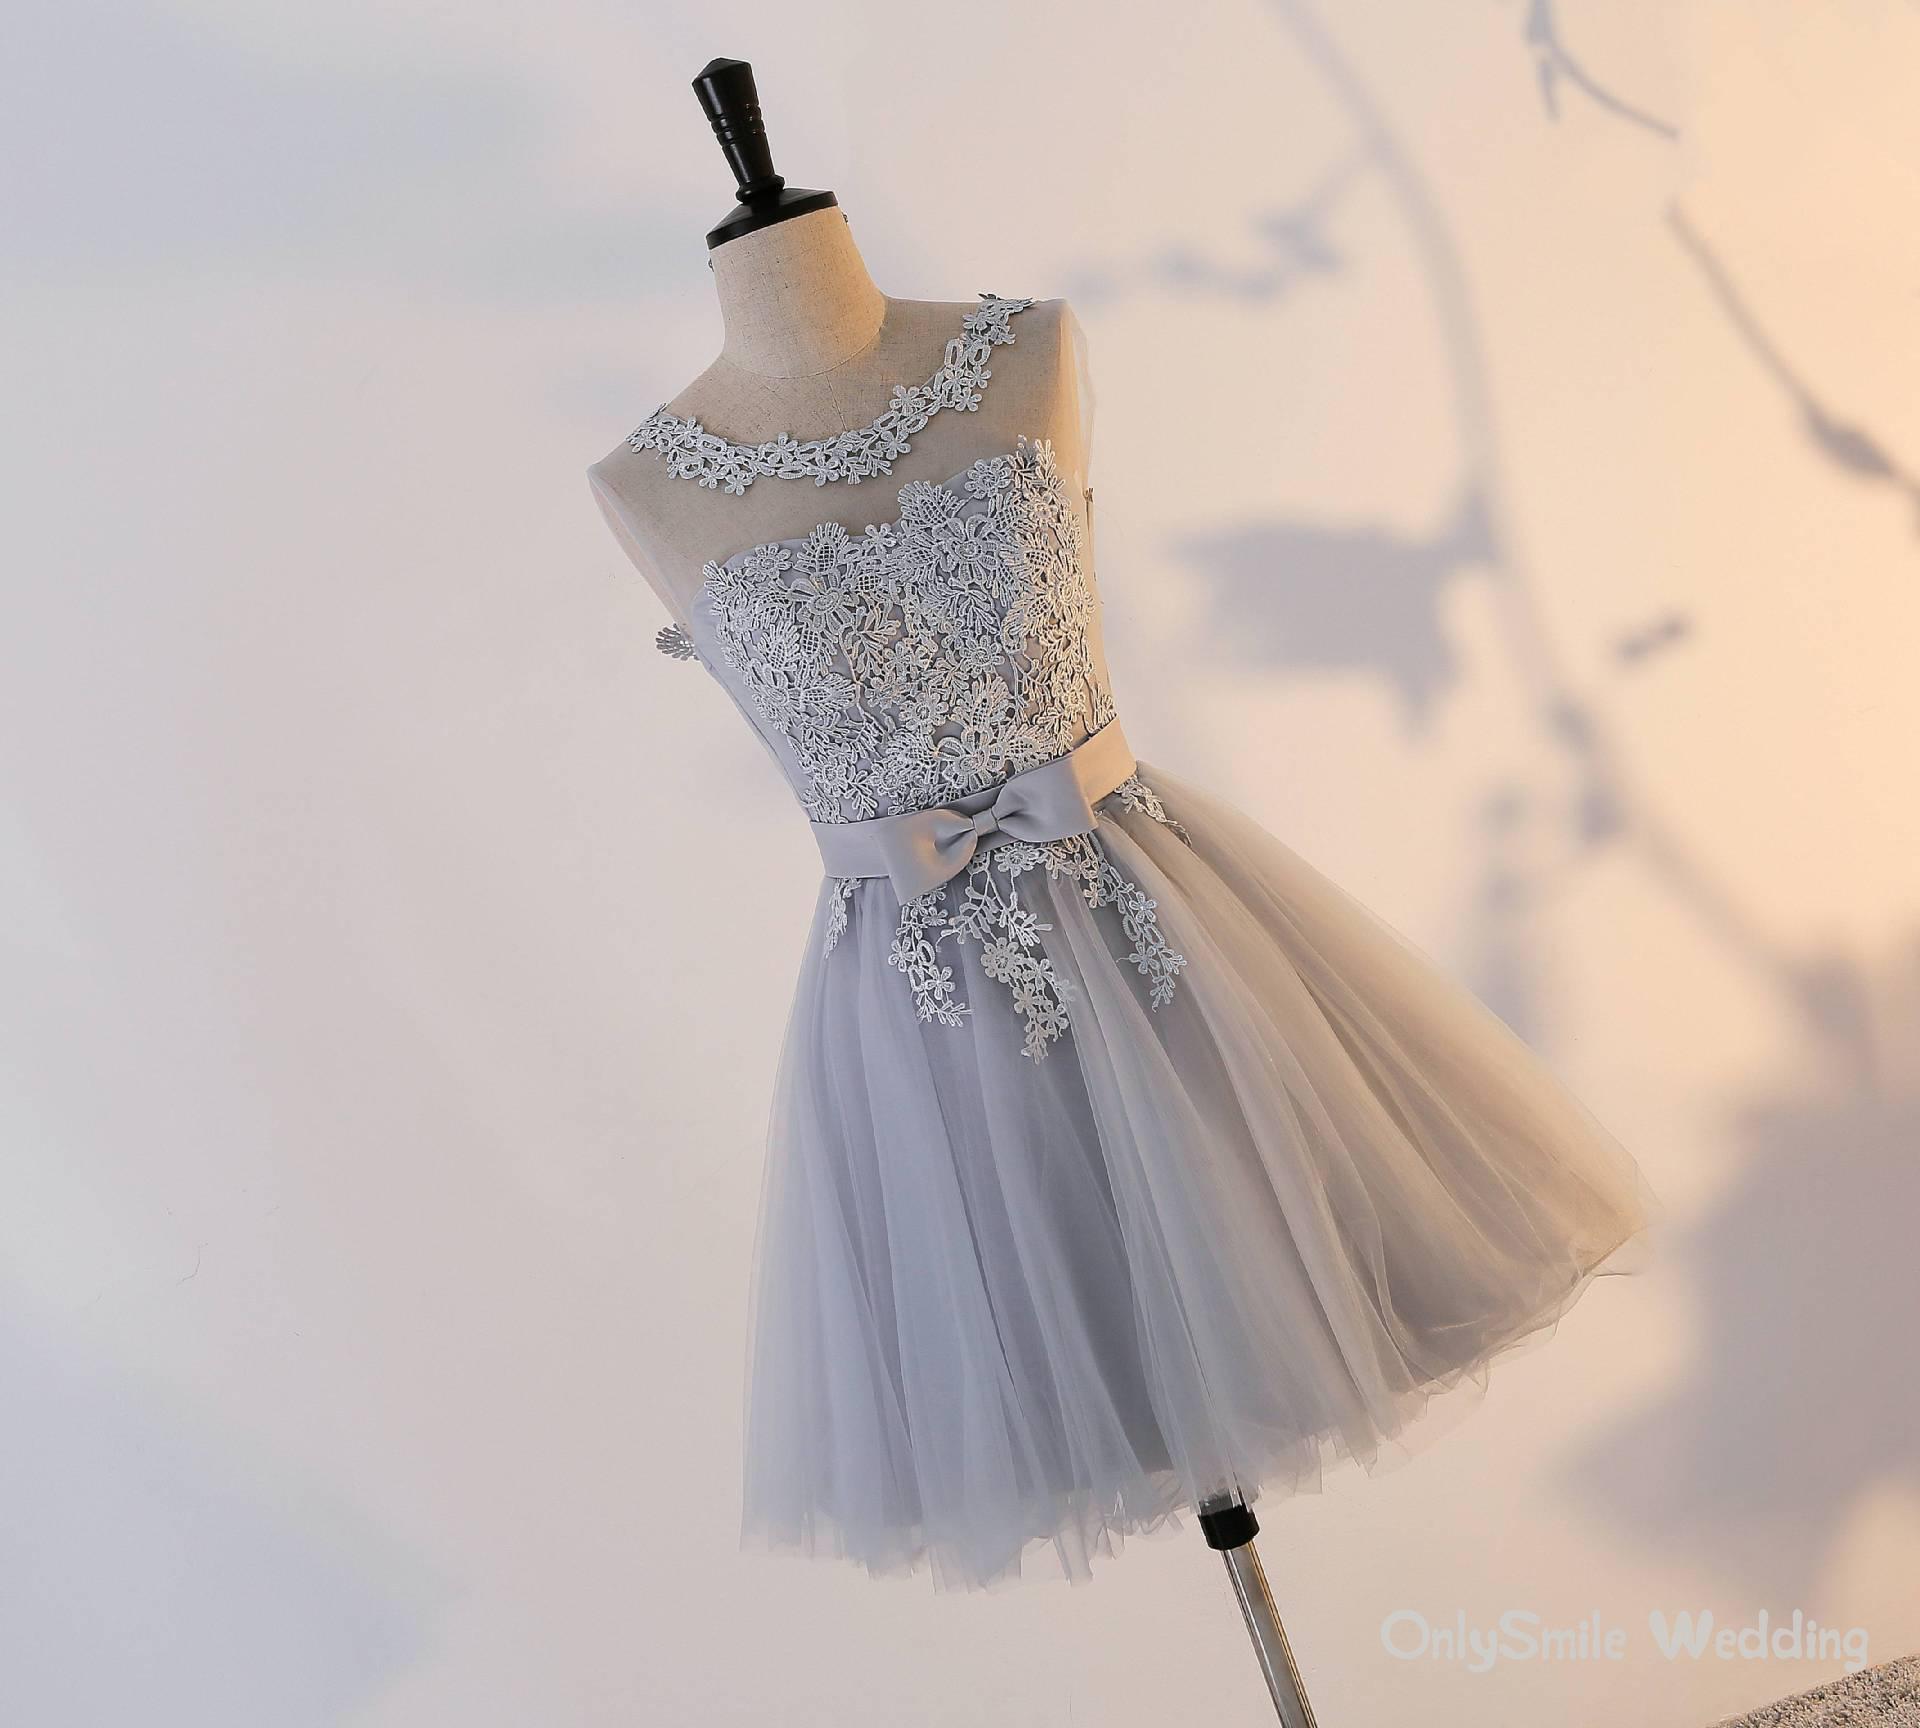 Vestidos curtos Prom 2019 Sexy Backless Lace Up Cinza Prom Vestido Formal Mulheres Ocasião Vestidos de Festa Robe De Soirée